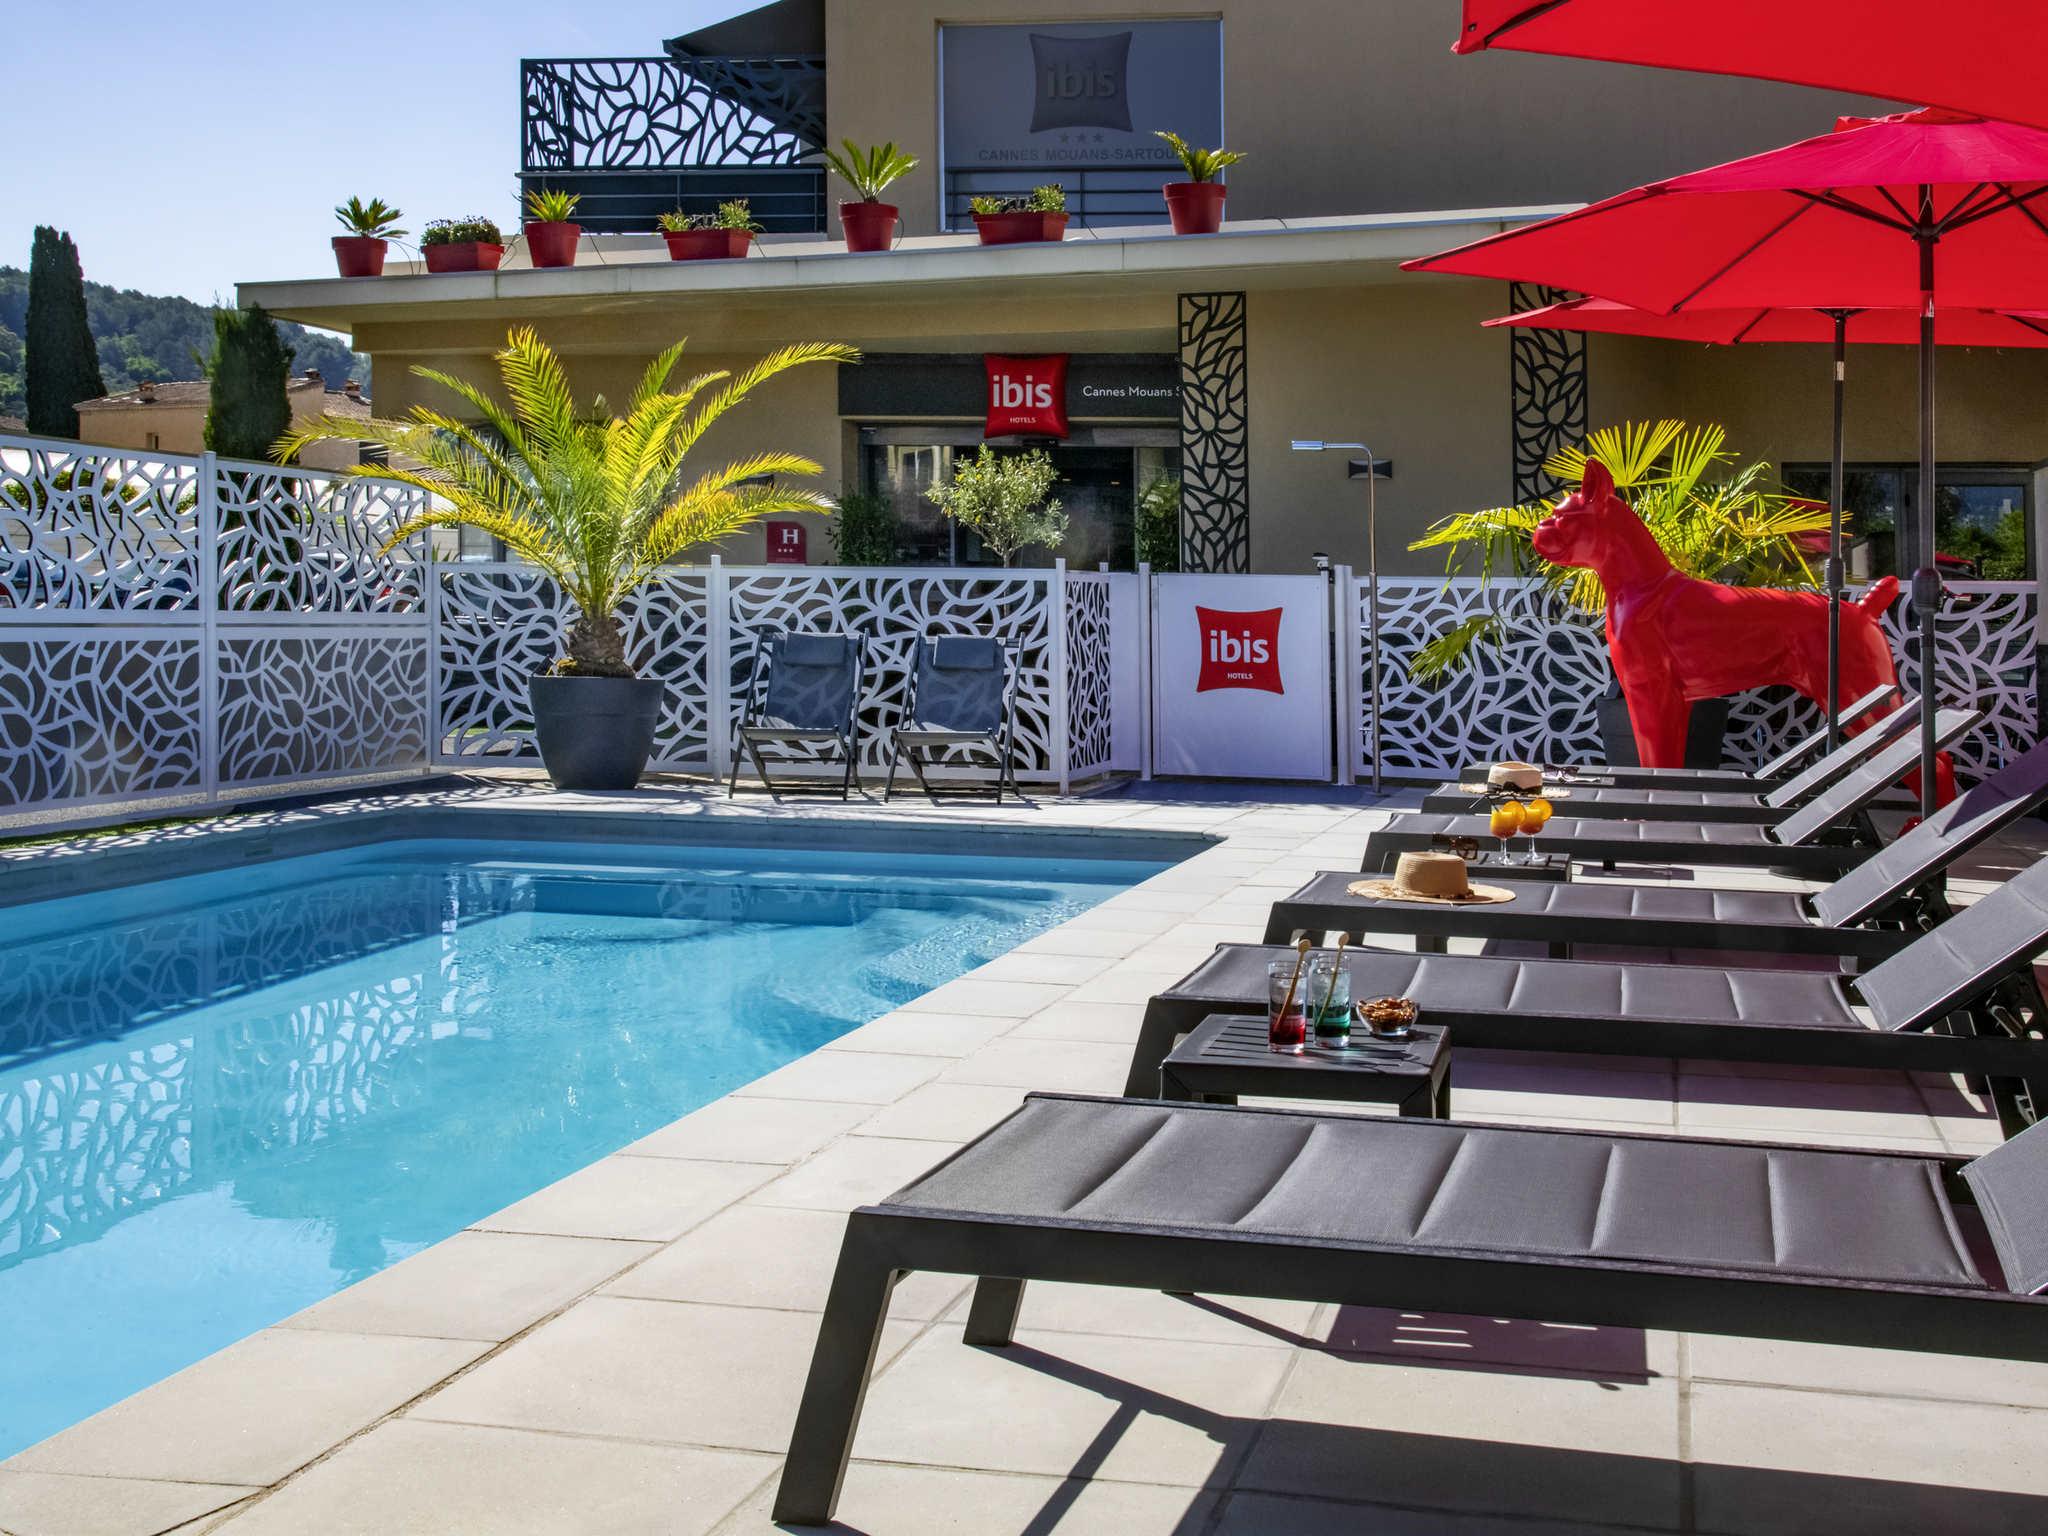 Otel – ibis Cannes Mouans-Sartoux